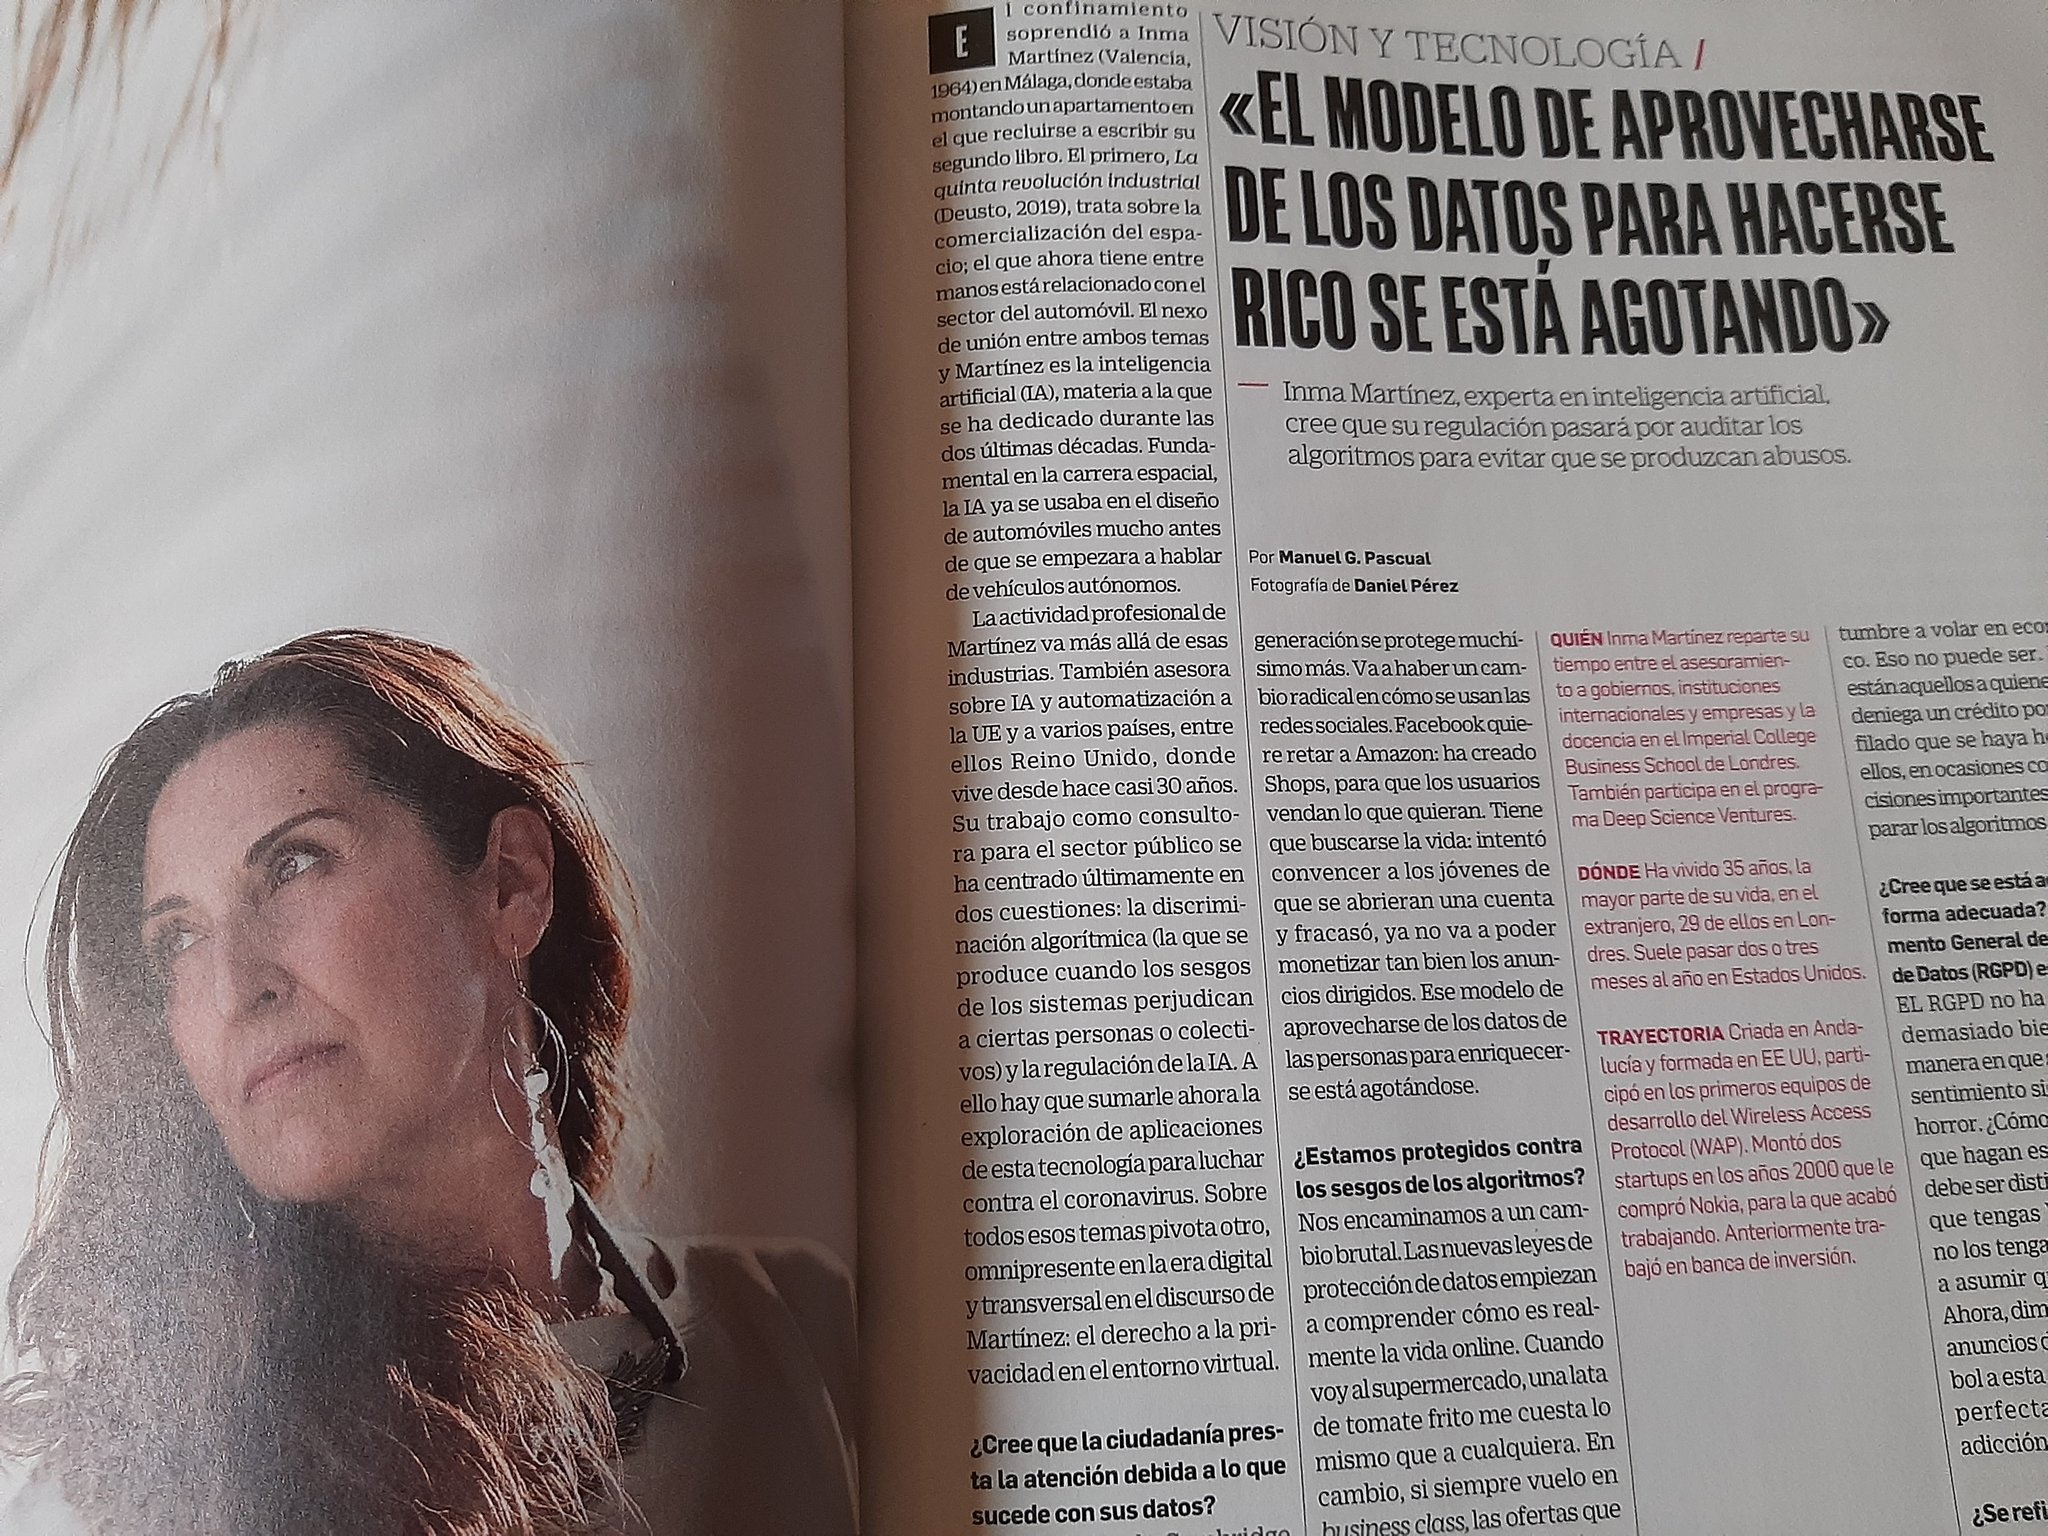 Inma Martínez 1